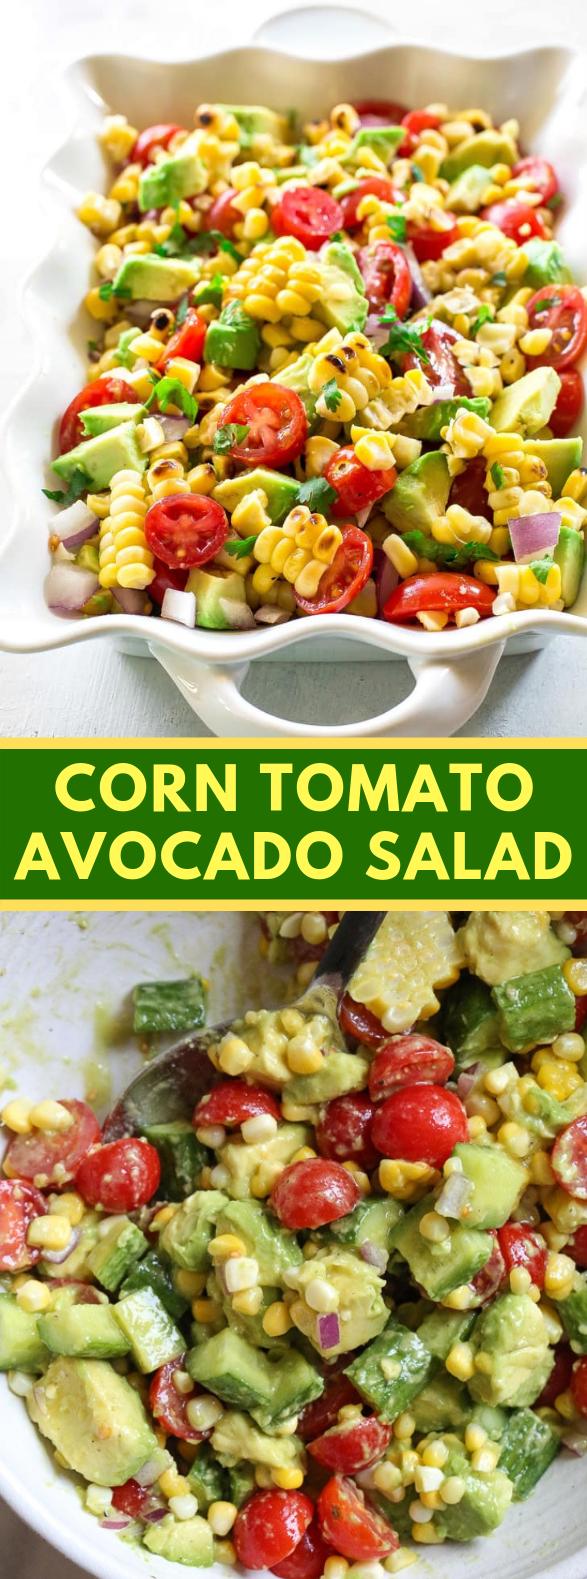 CORN TOMATO AVOCADO SALAD #vegetarian #summer